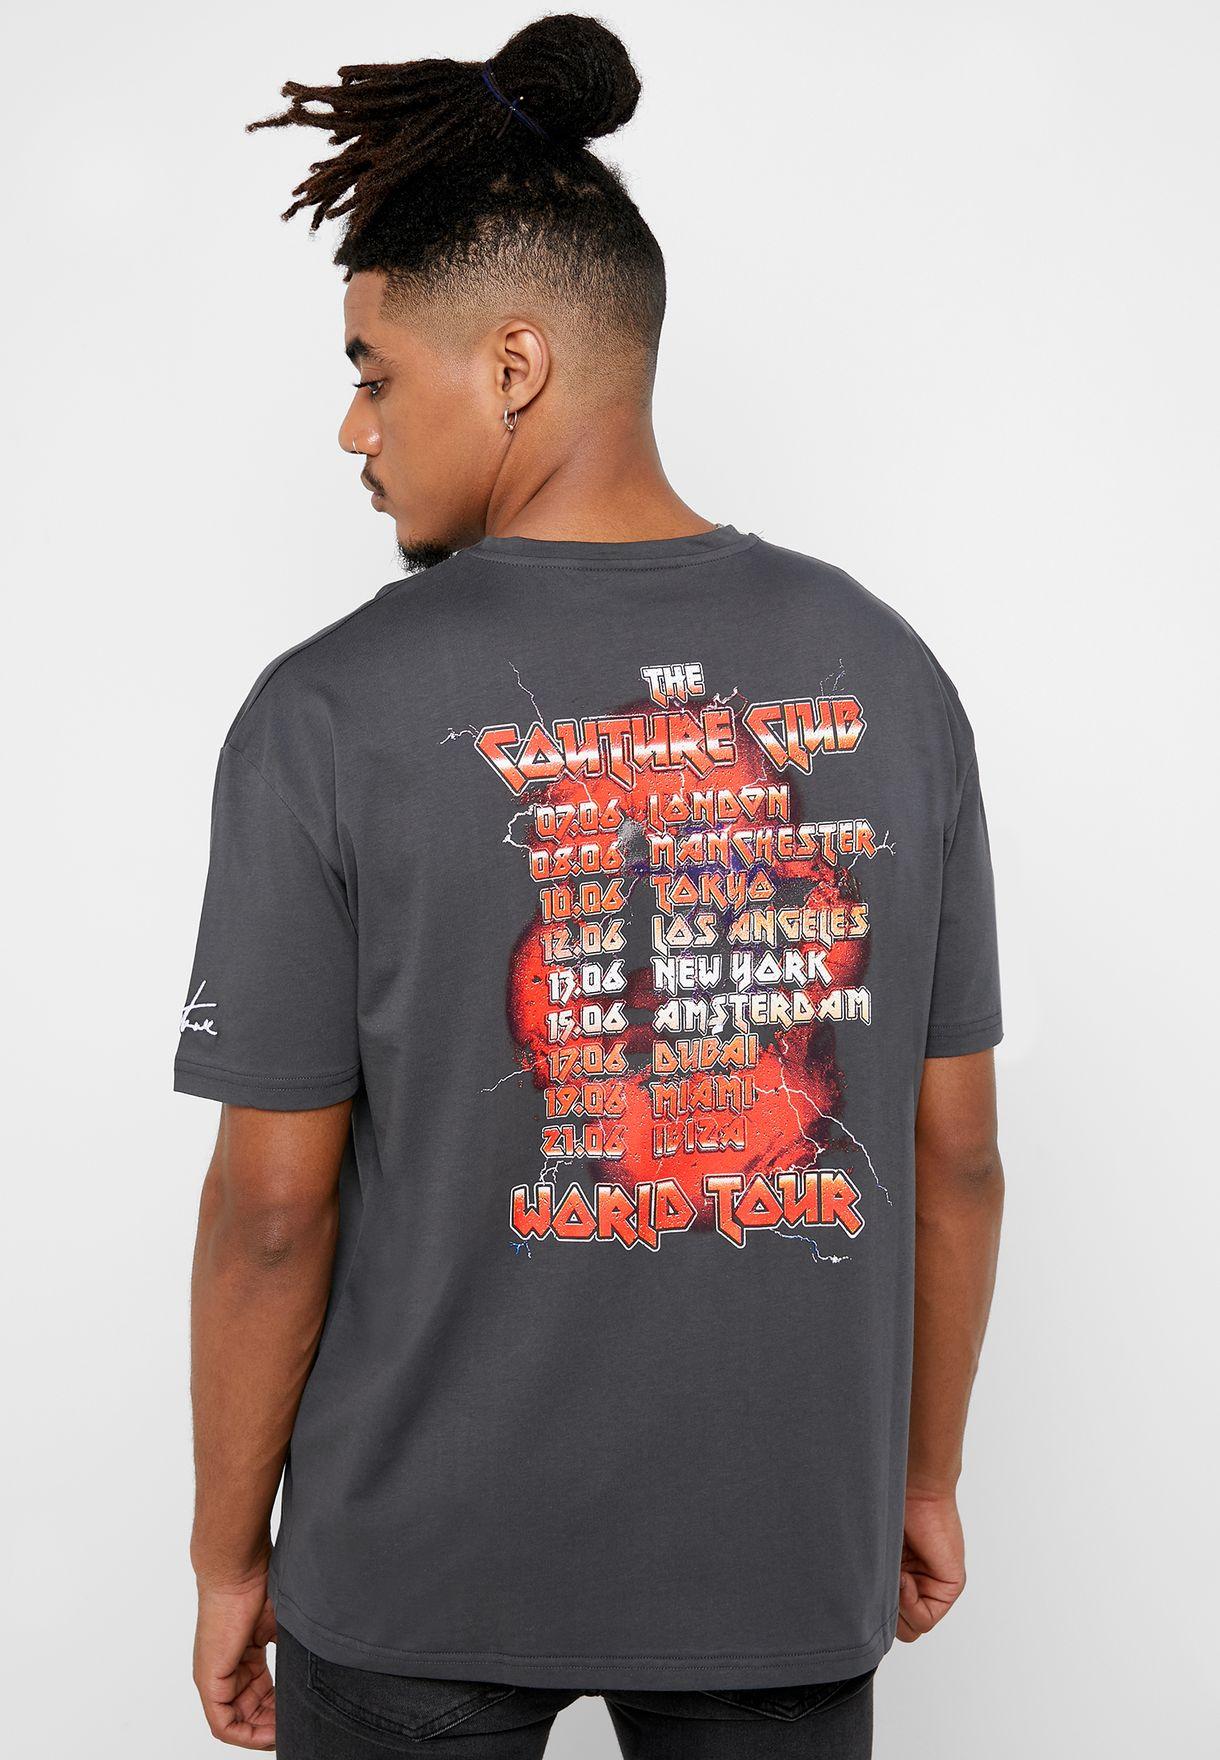 Signature World Tour T-Shirt